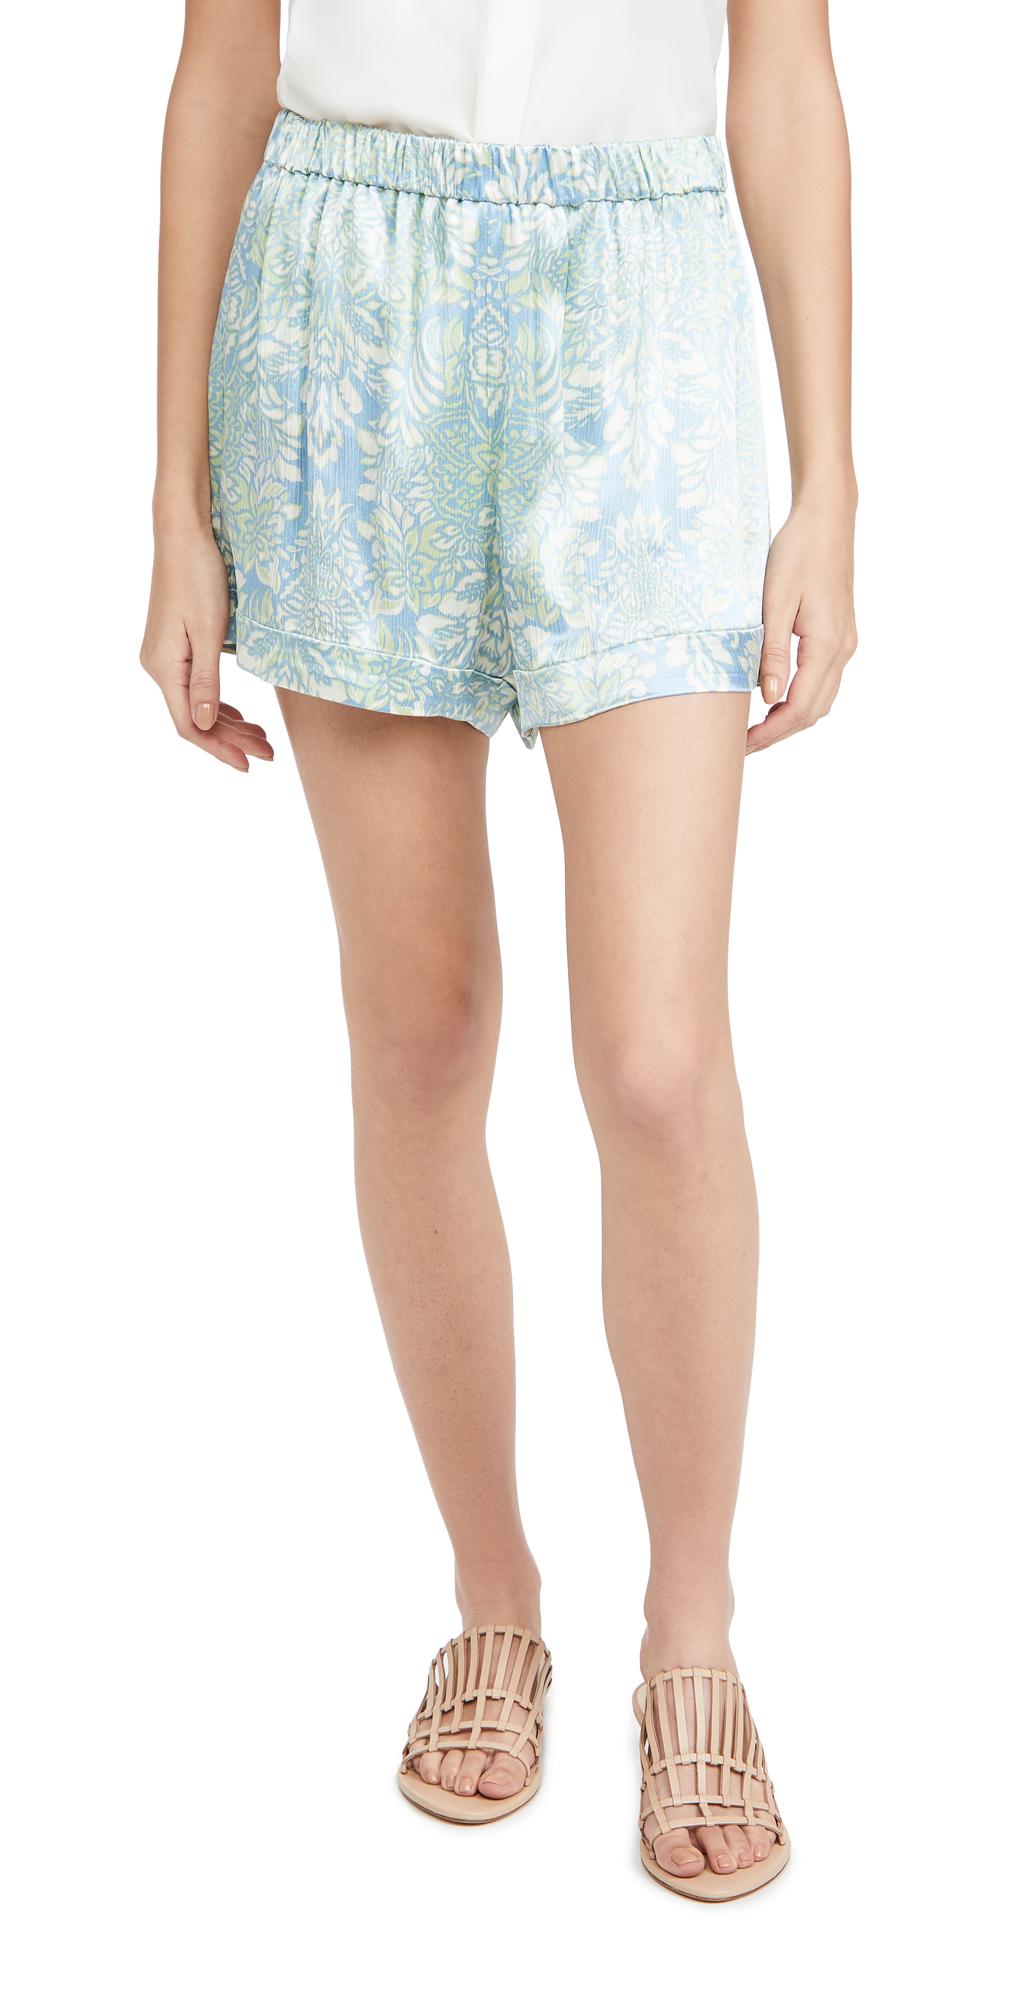 Alexis Darra Shorts